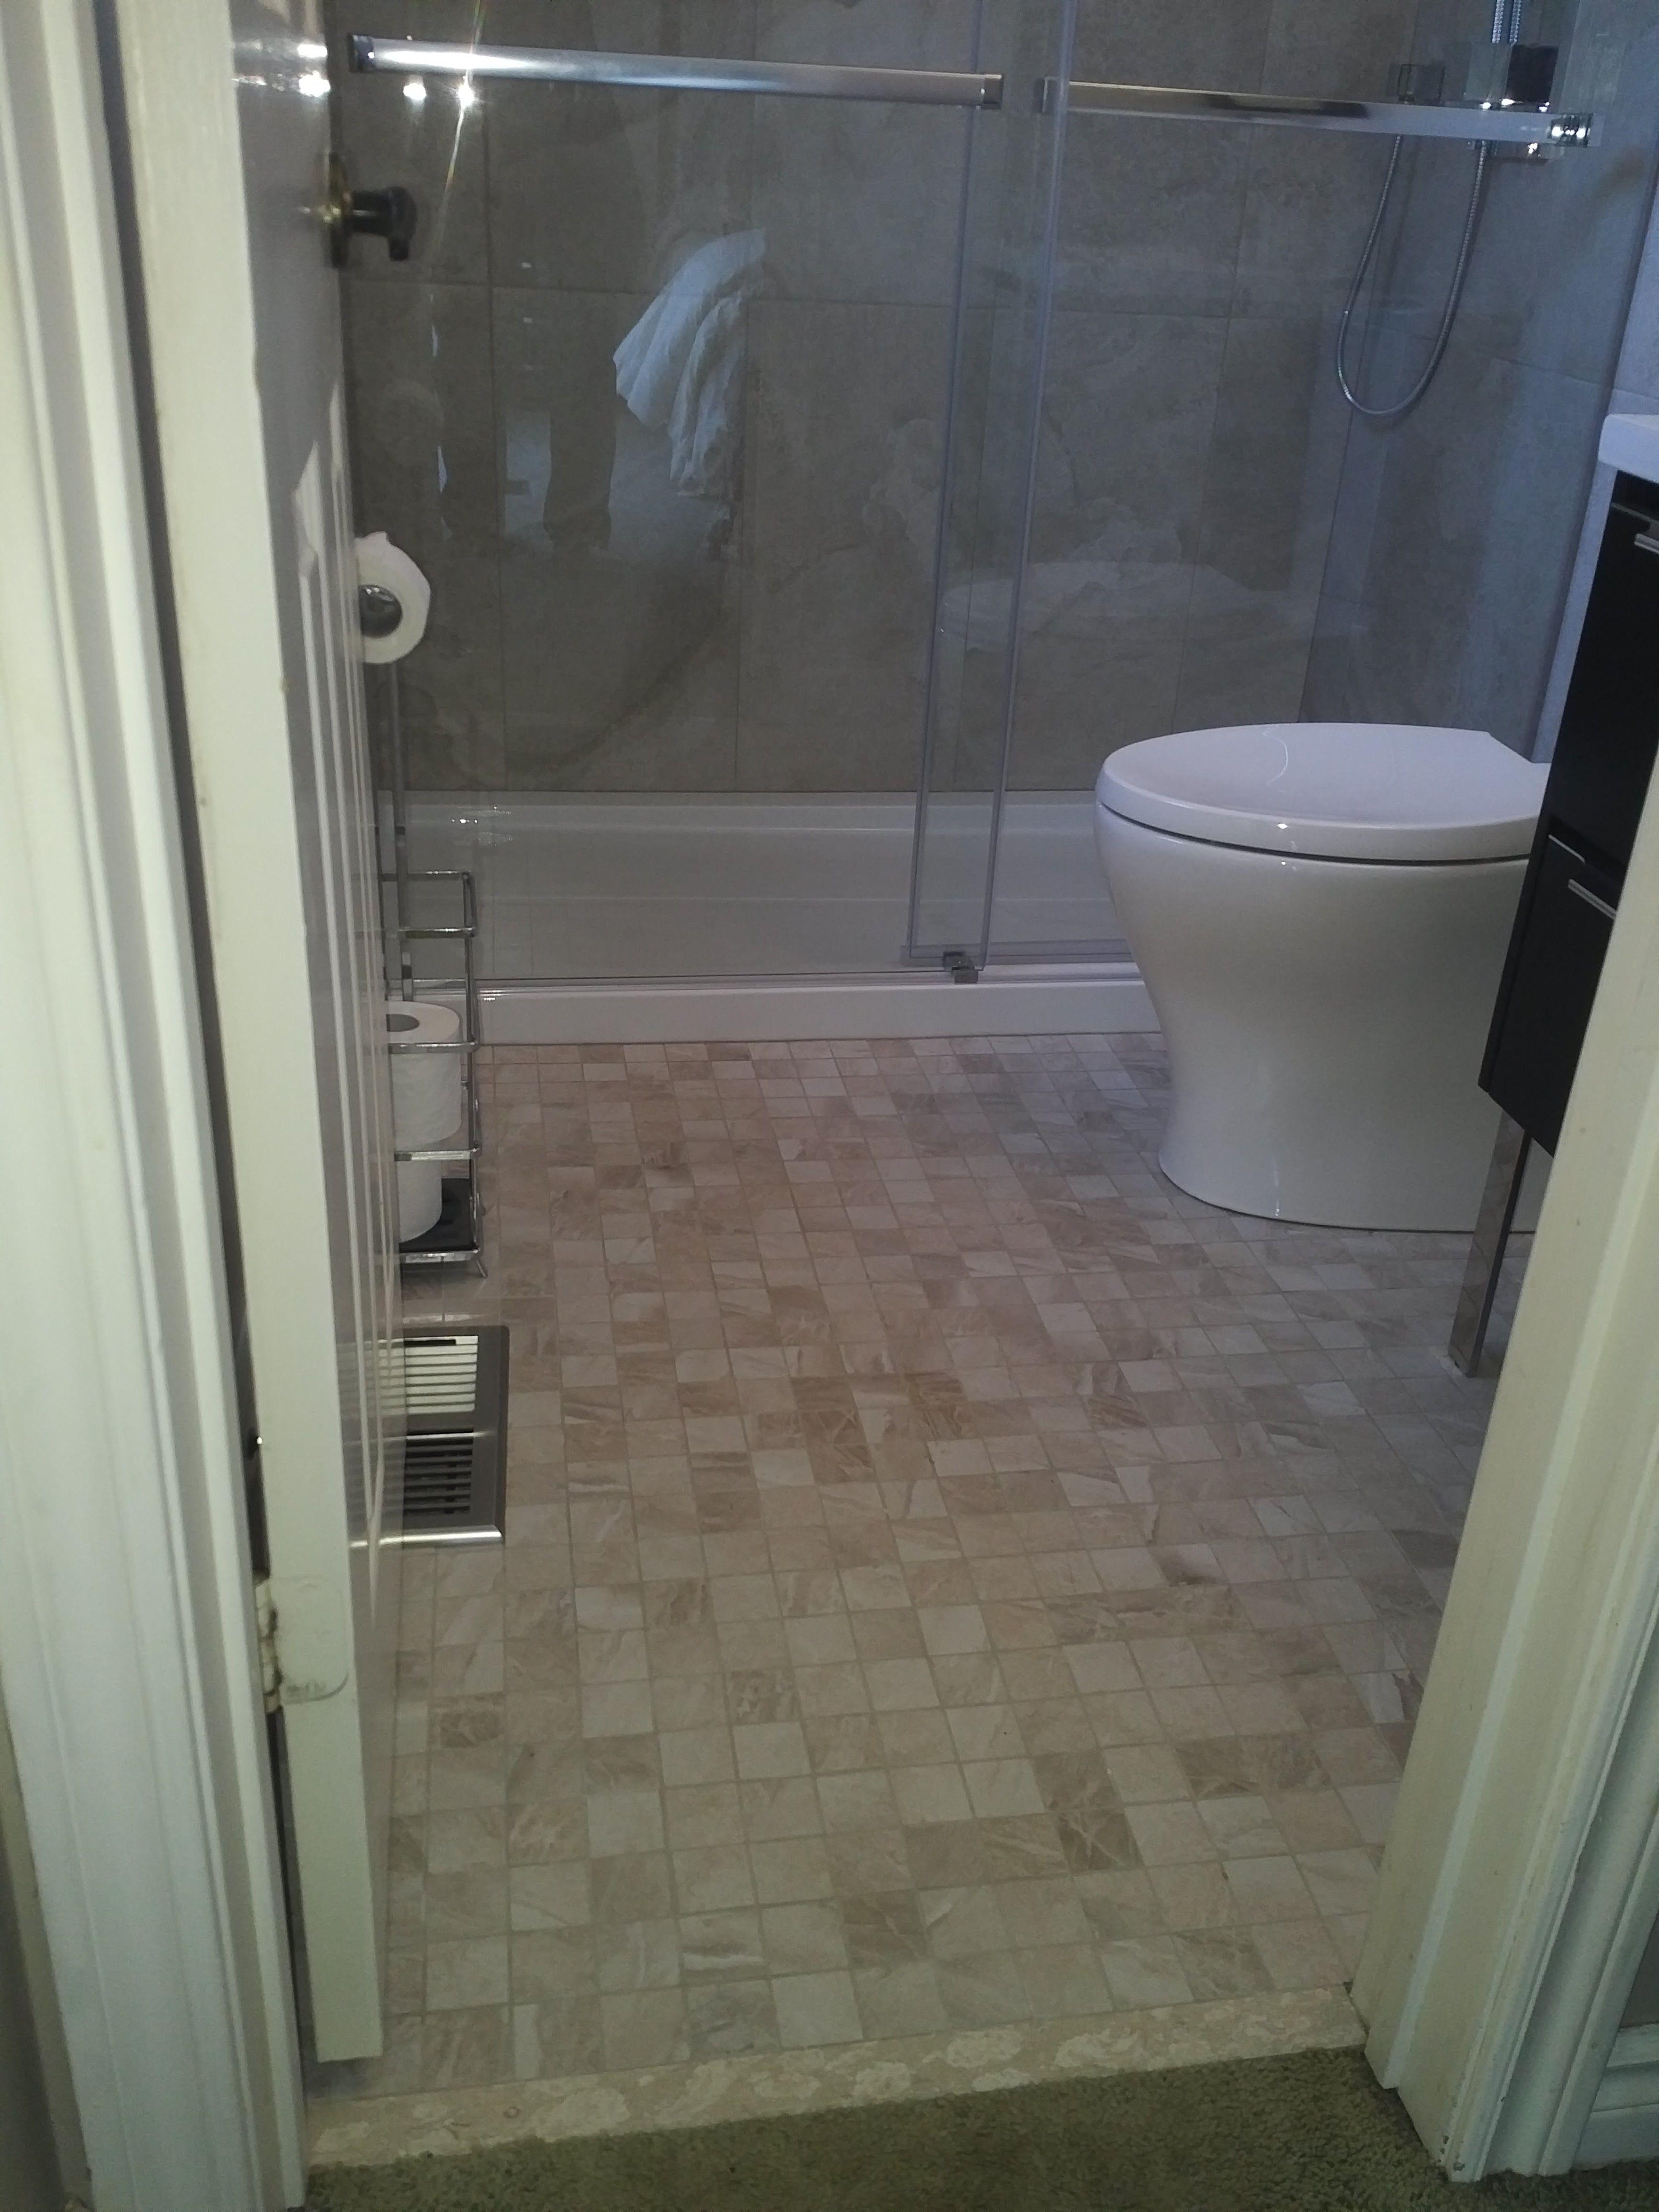 Calgary bathworks calgary bathroom renovations bathroom gallery - Fleurco Gemini Shower Doors With A Kohler Toilet Caledon Tile Renovation